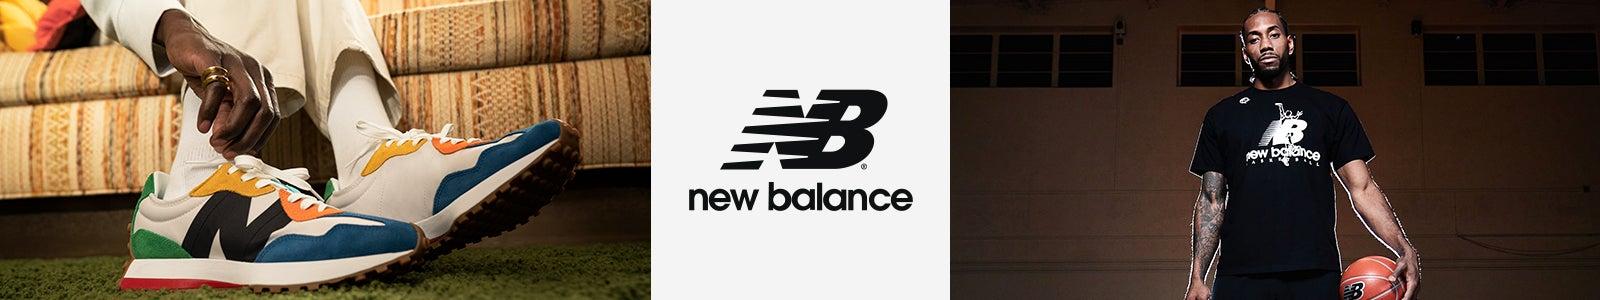 new balance 273 women black